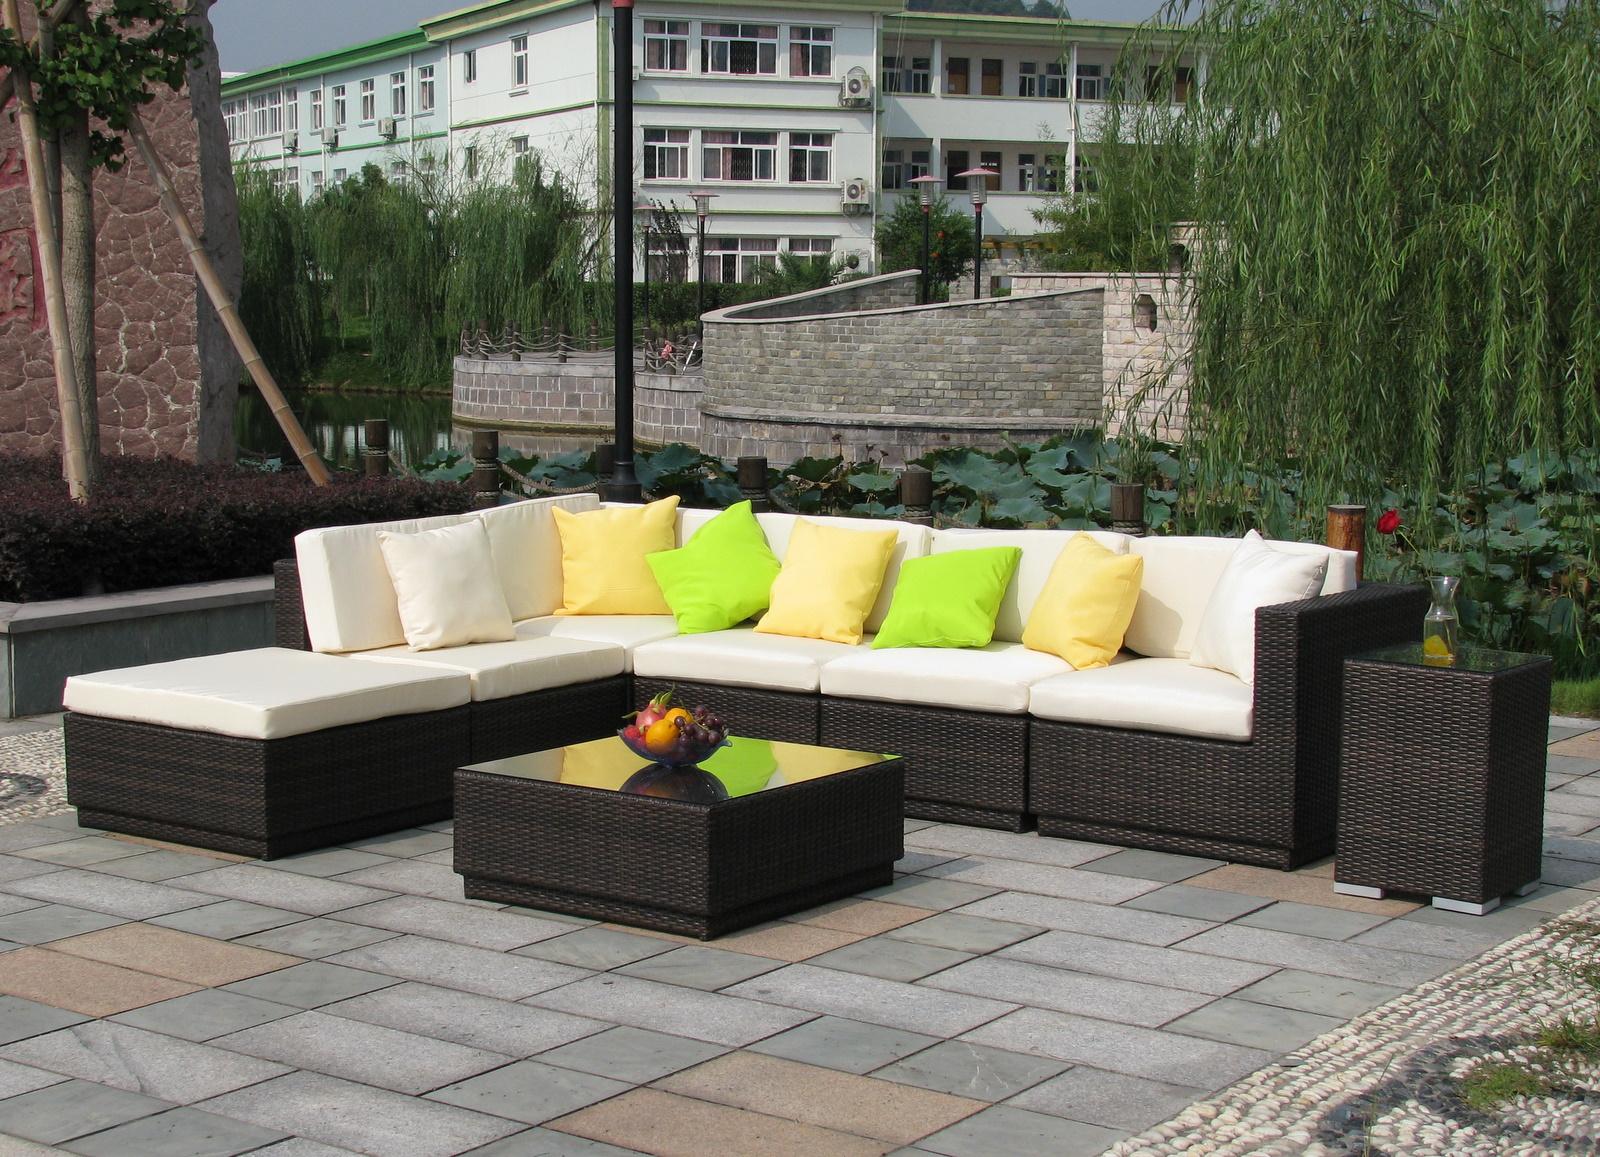 Gartenmoebel Ambiente Kollektion Ideen Garten Design Als